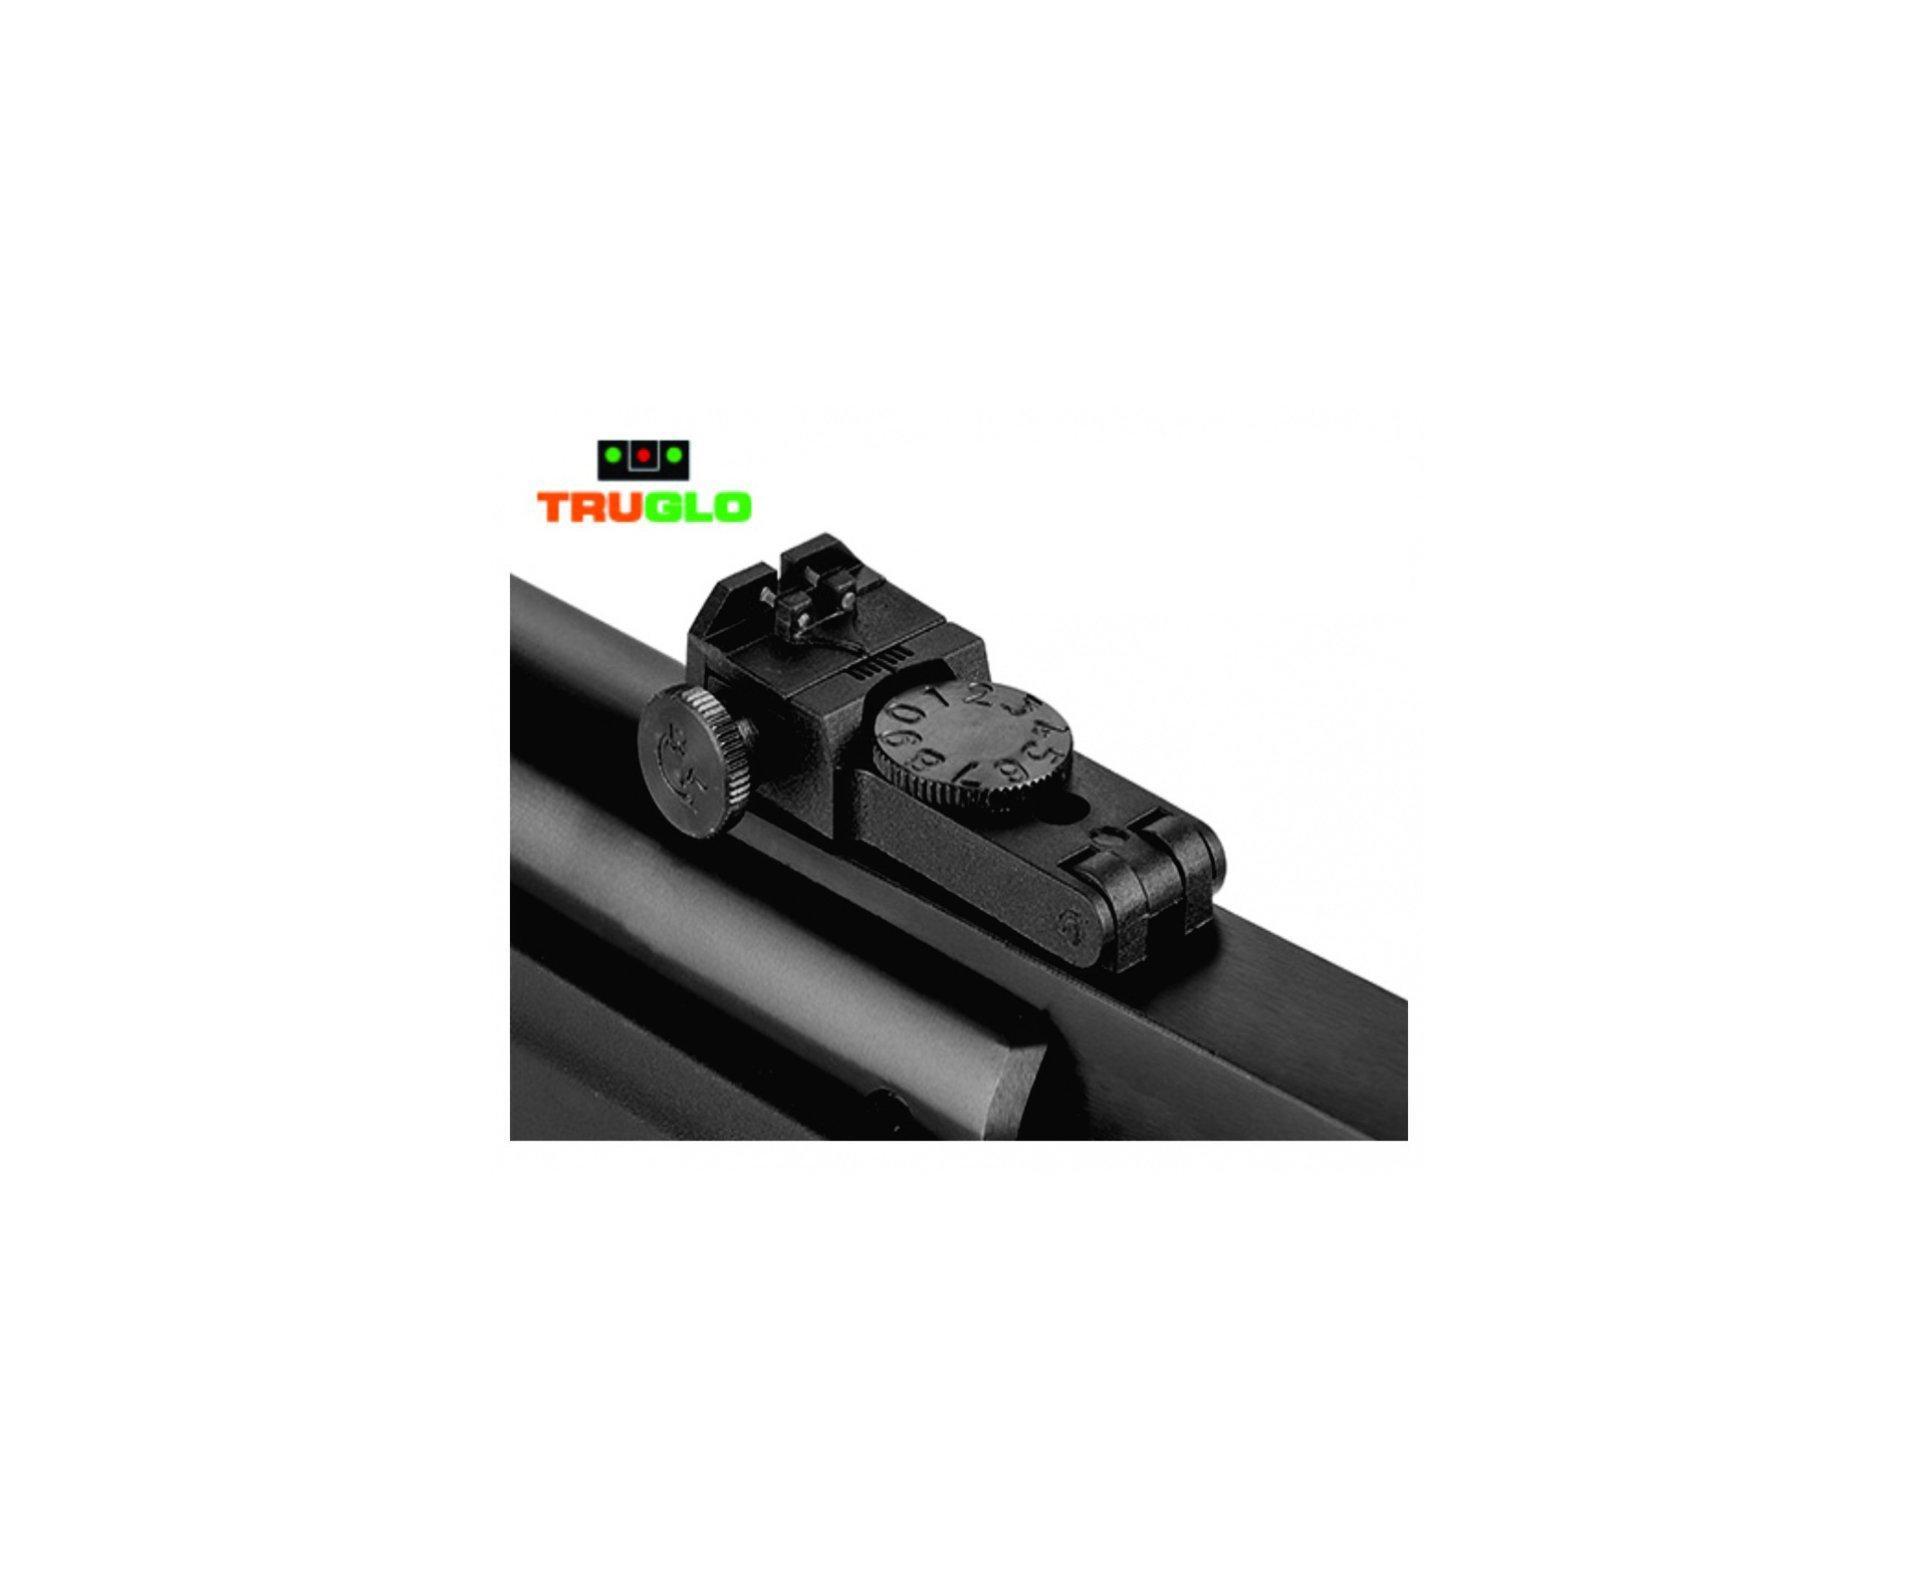 Carabina De Pressão Hatsan Striker Edge Cal 4.5 Vortex Gas Ram 60kg + Chumbinho + Capa